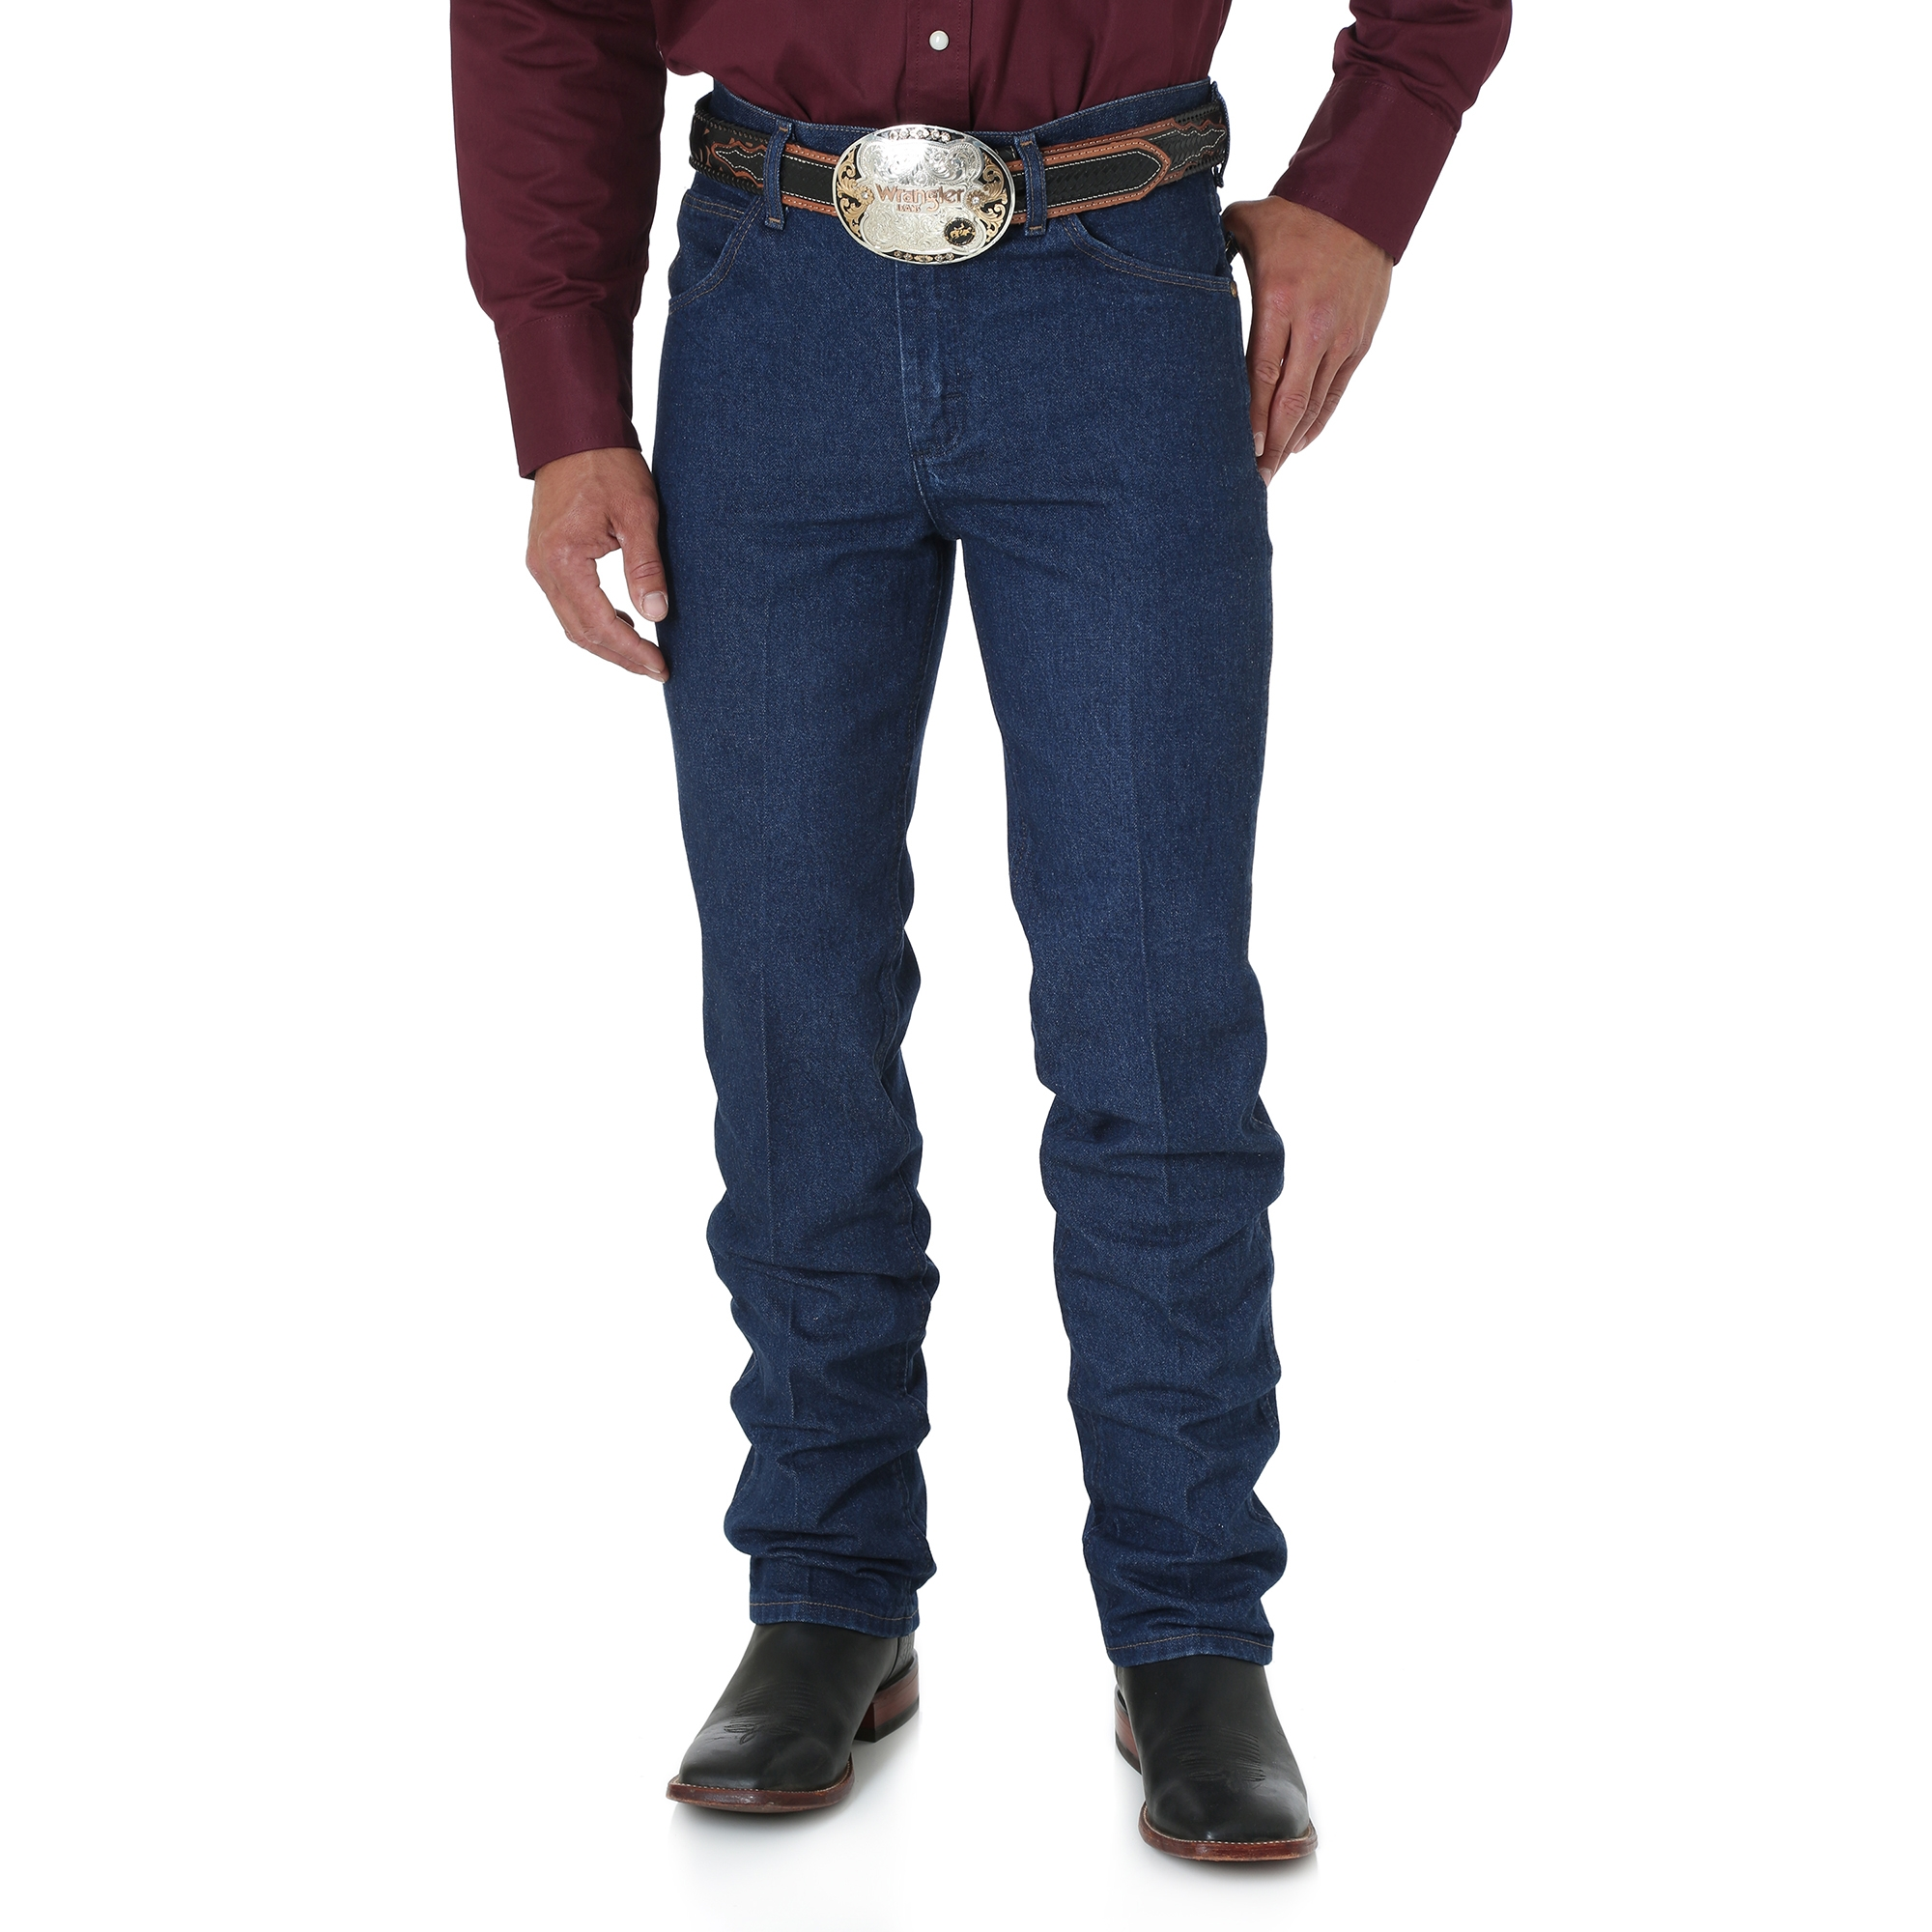 01eda616 Wrangler - Men's Premium Performance Cowboy Cut Slim Fit Jean - Prewashed